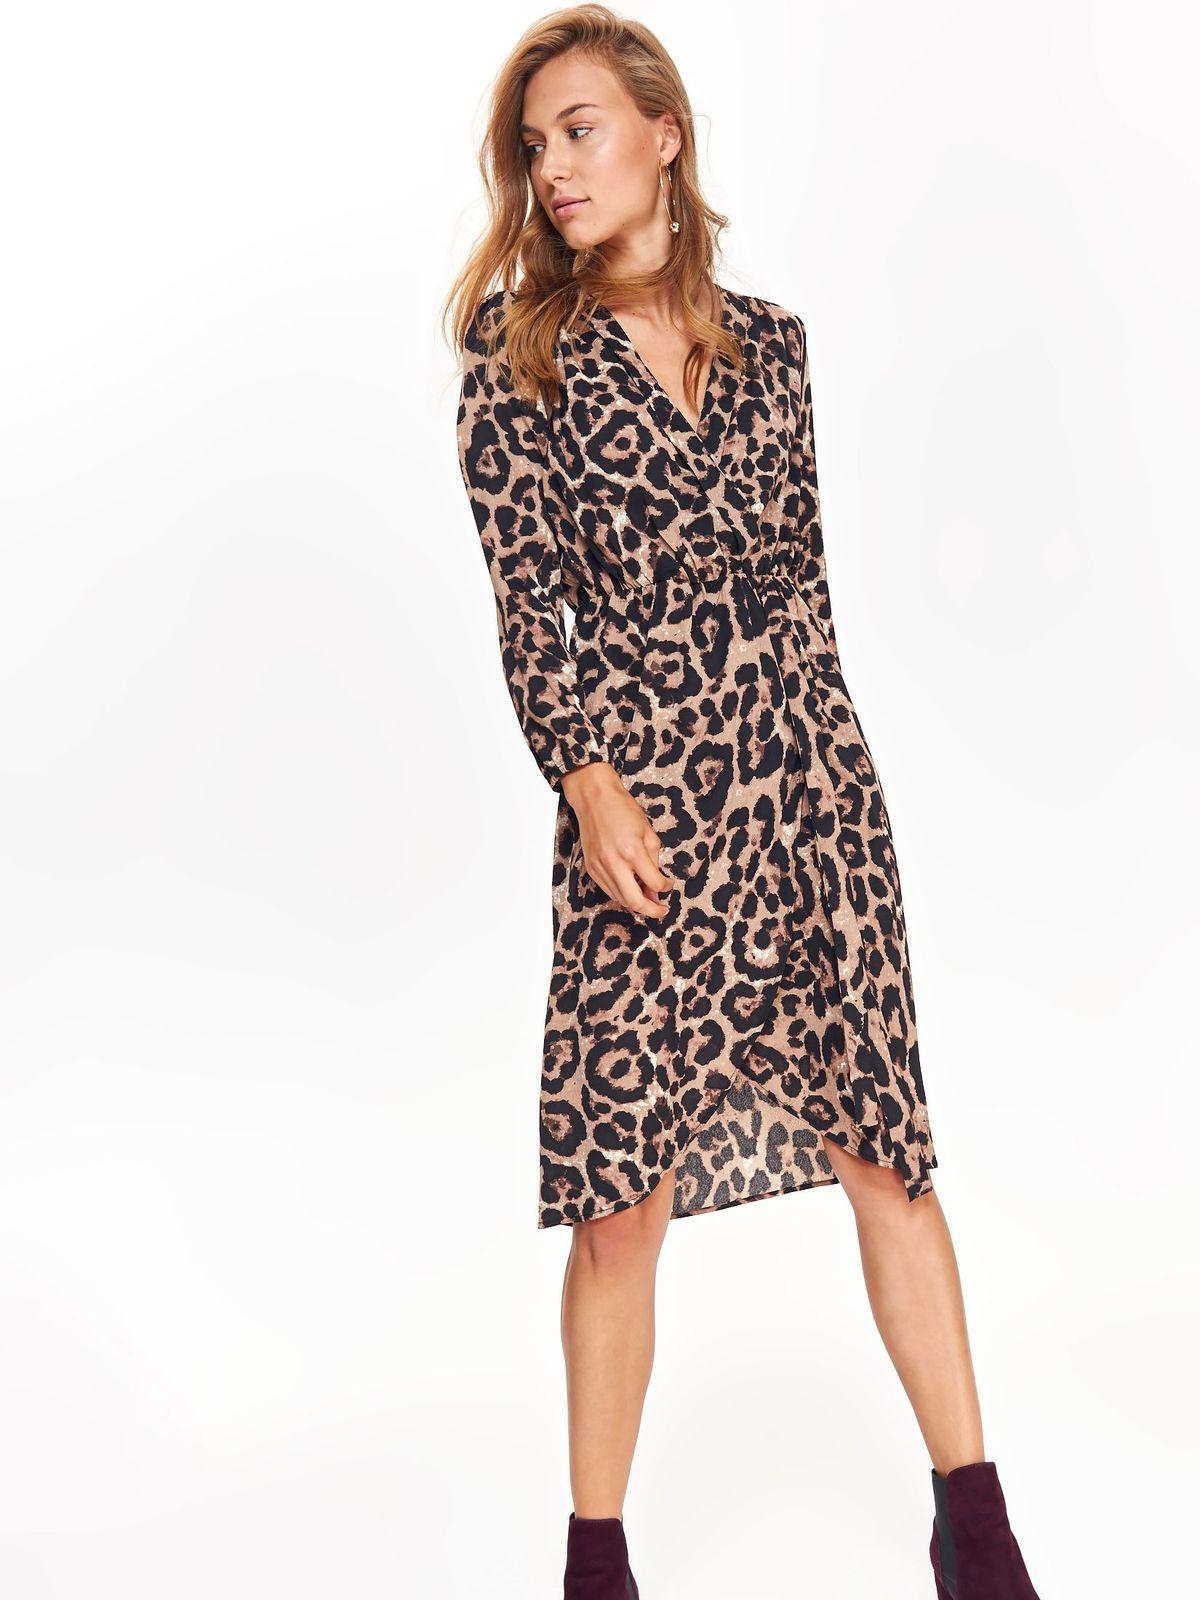 Top Secret peach casual asymmetrical dress with v-neckline long sleeved